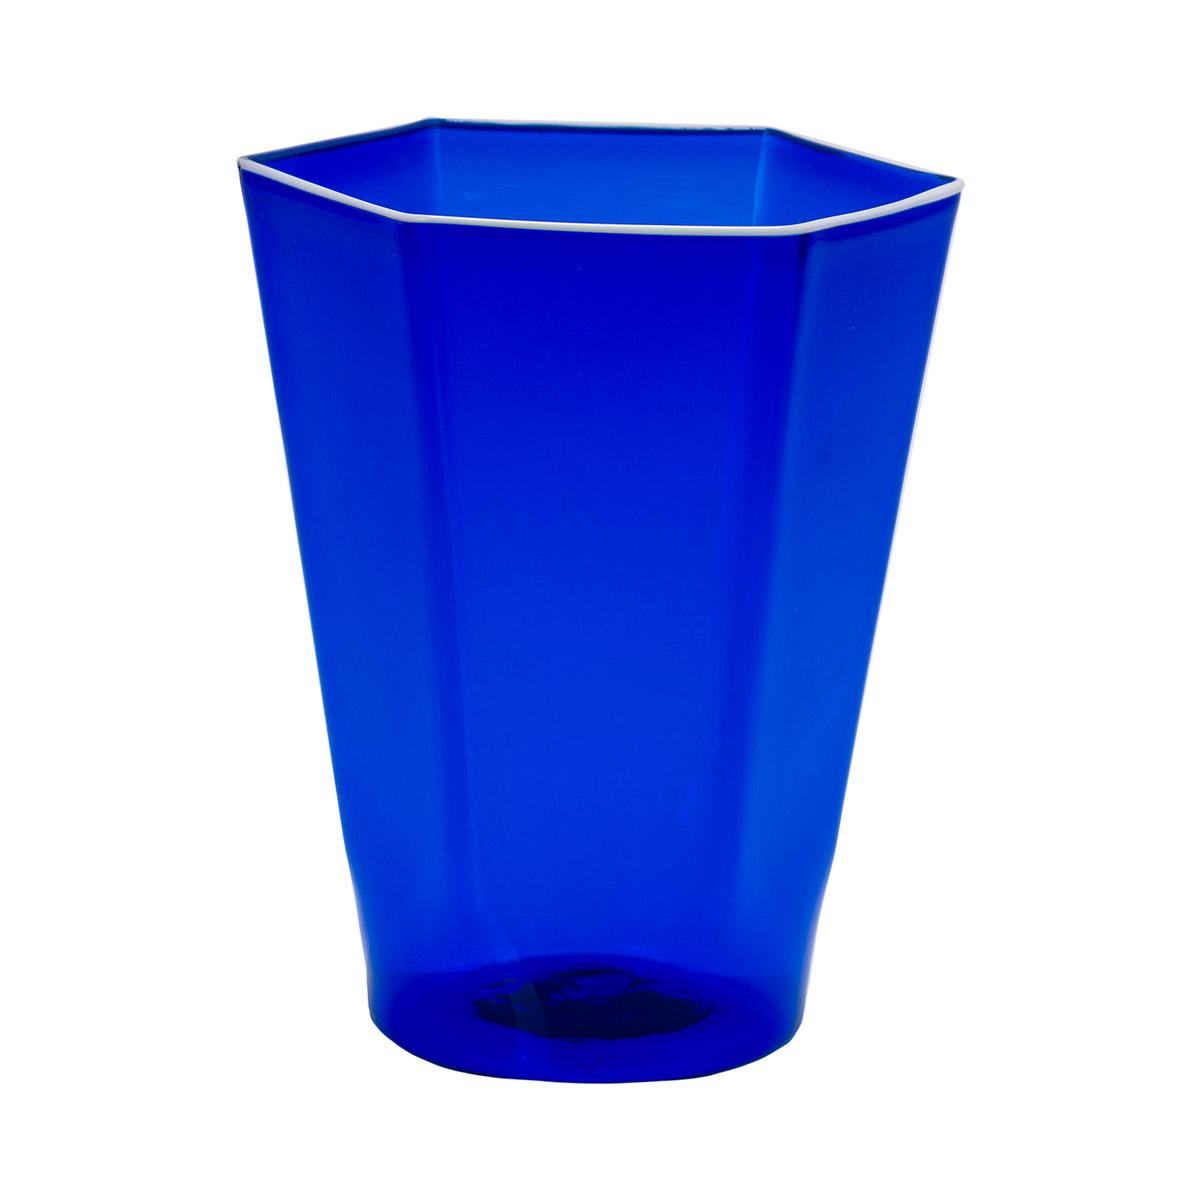 laguna-blue-glass-luxe-handmade-murano-electric-bright